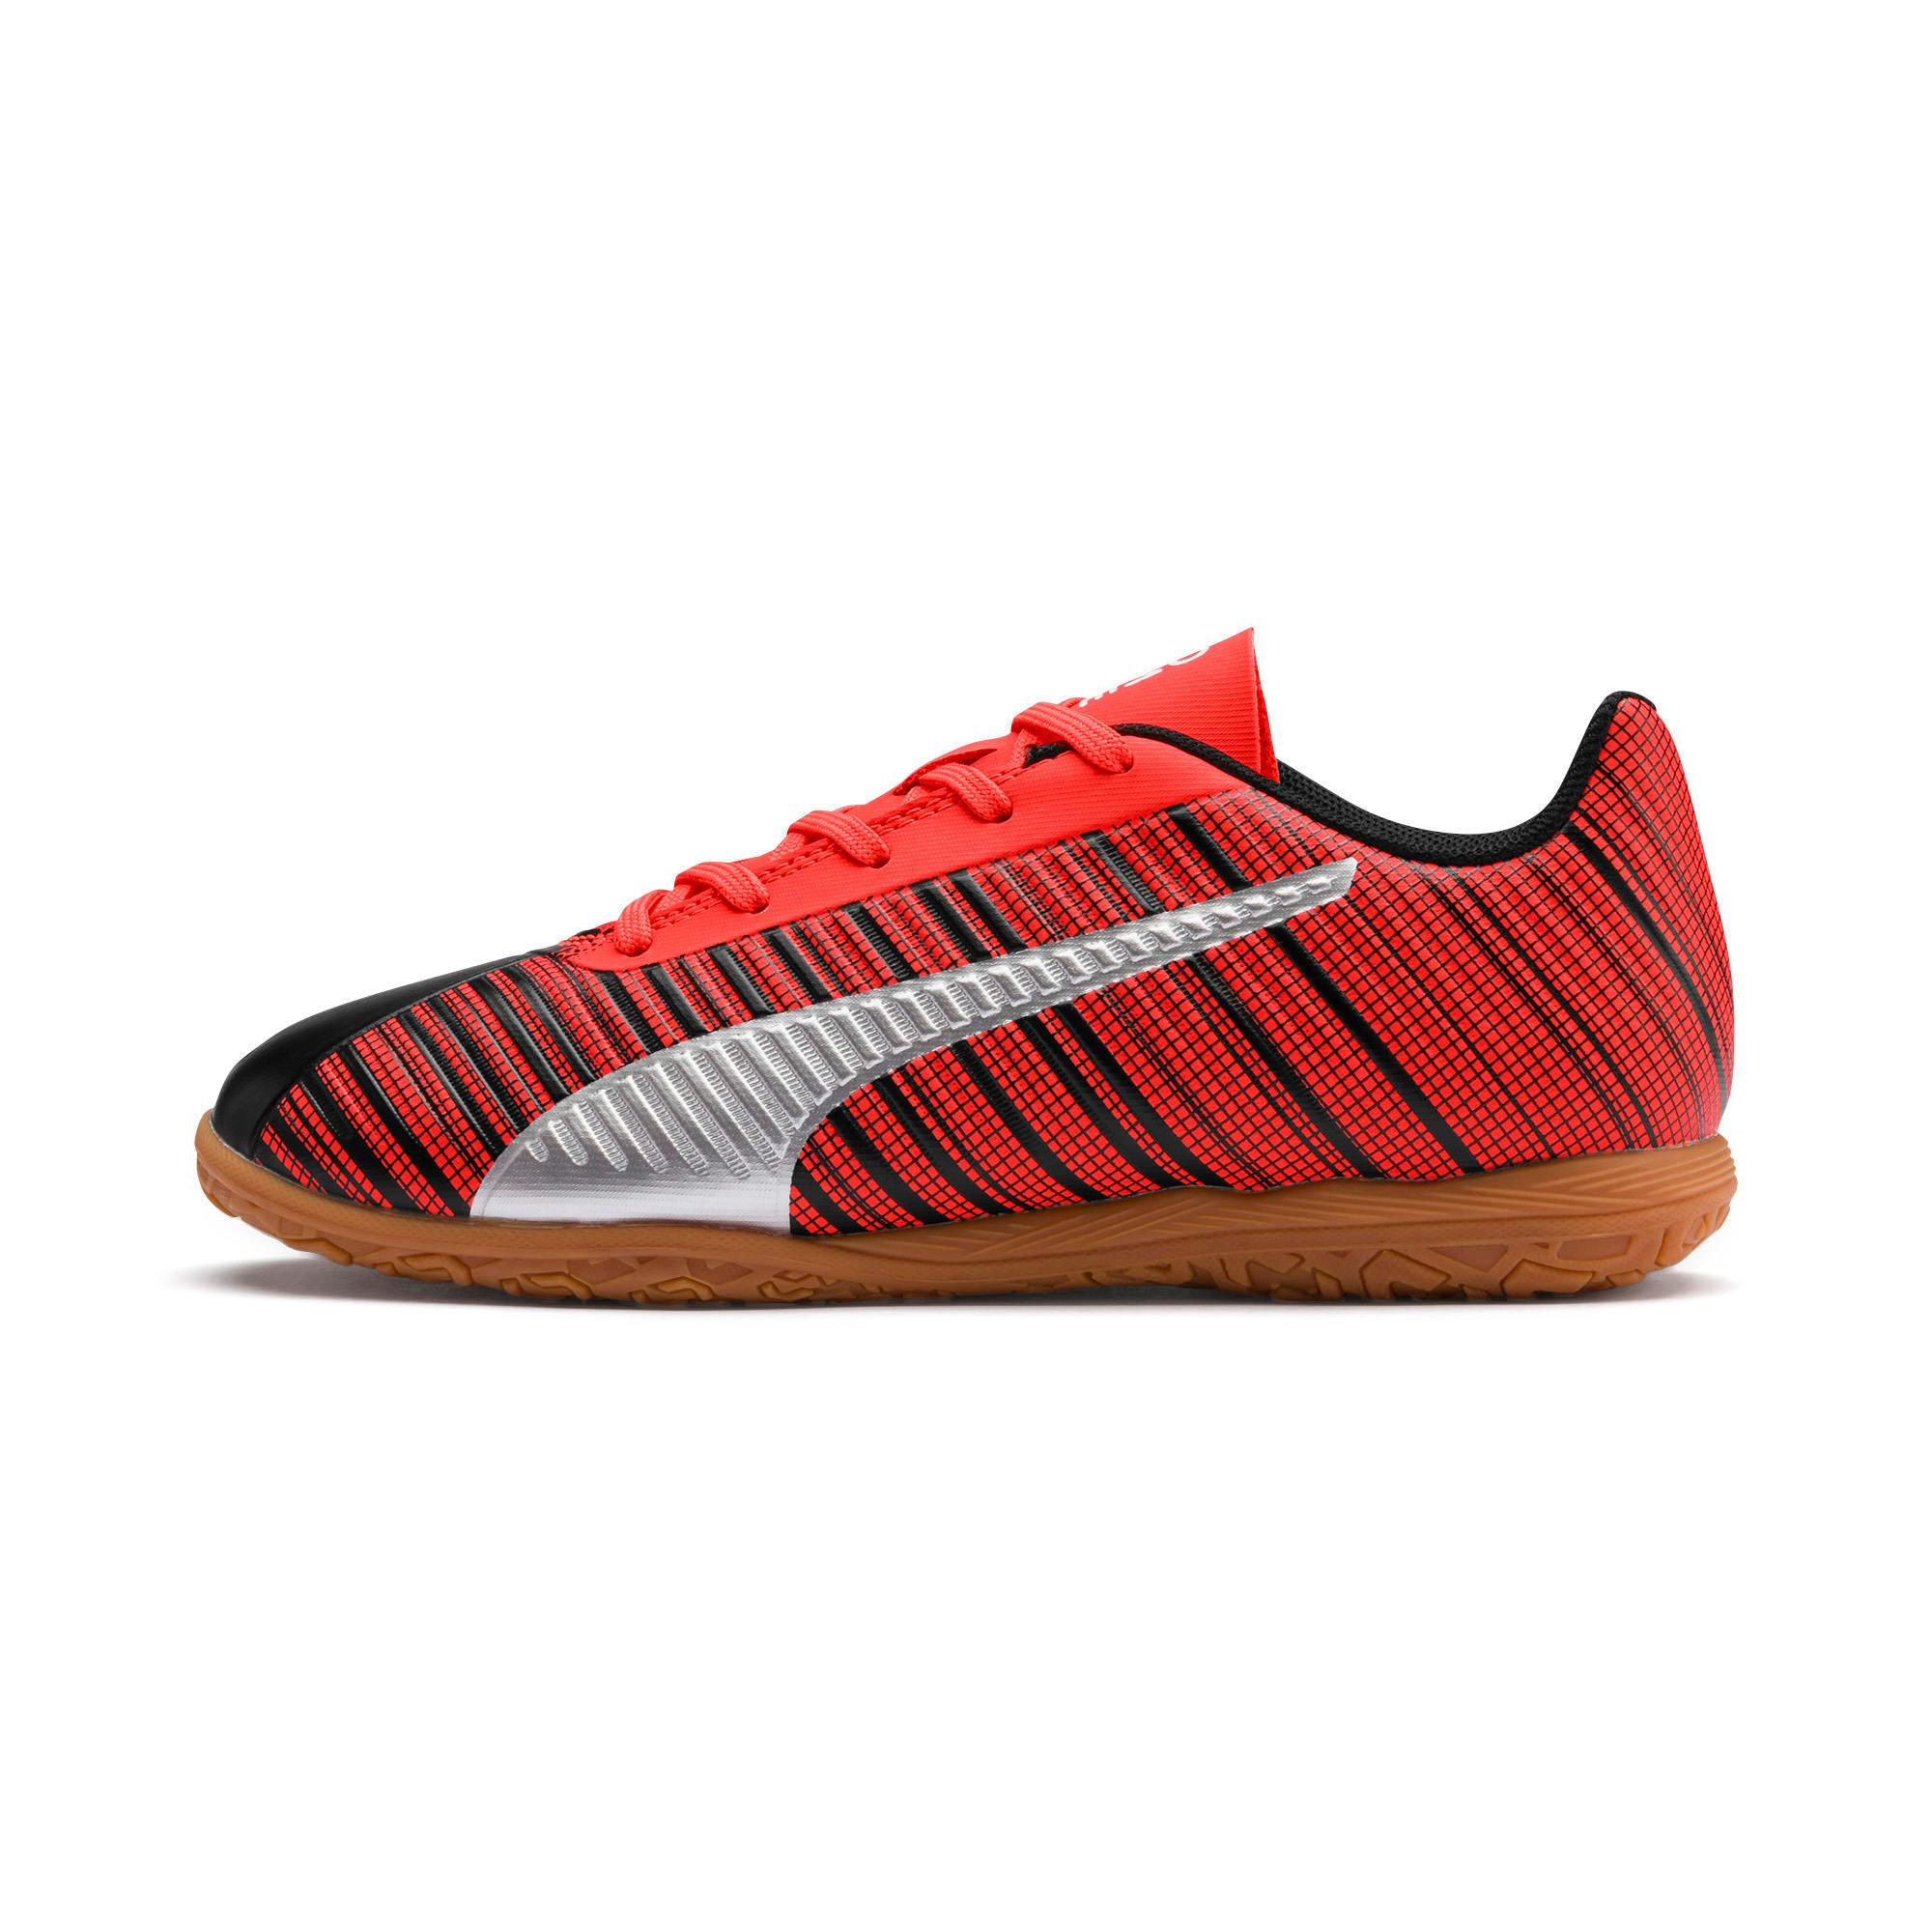 Miniatura 1 de Zapatos de fútbol PUMA ONE 5.4 IT JR, Black-Red-Aged Silver-Gum, mediano